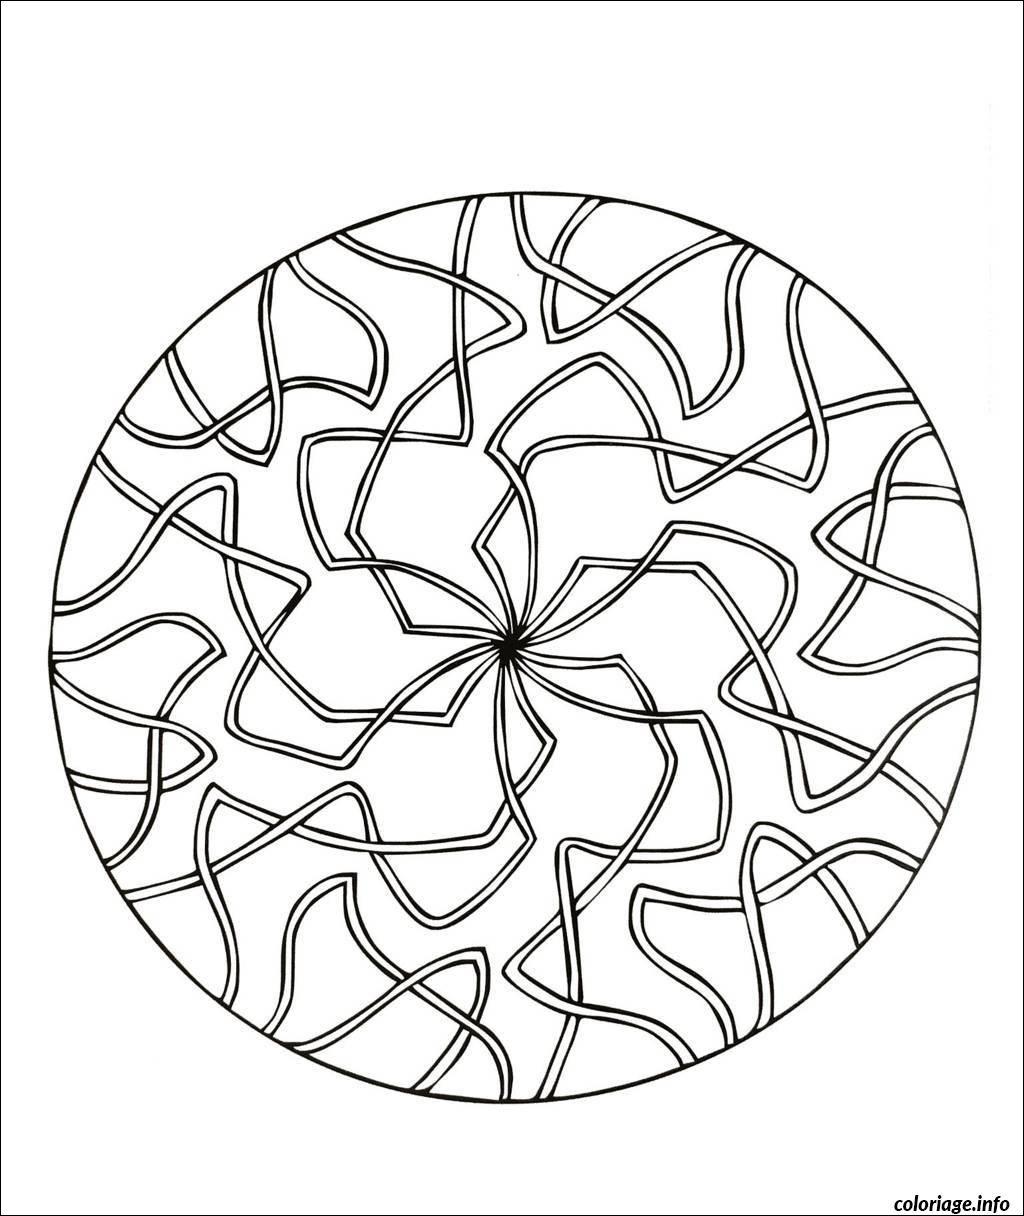 19 Utile Dessin Mandala Simple Collection Mandala Kleurplaten Mandala Kleurplaten